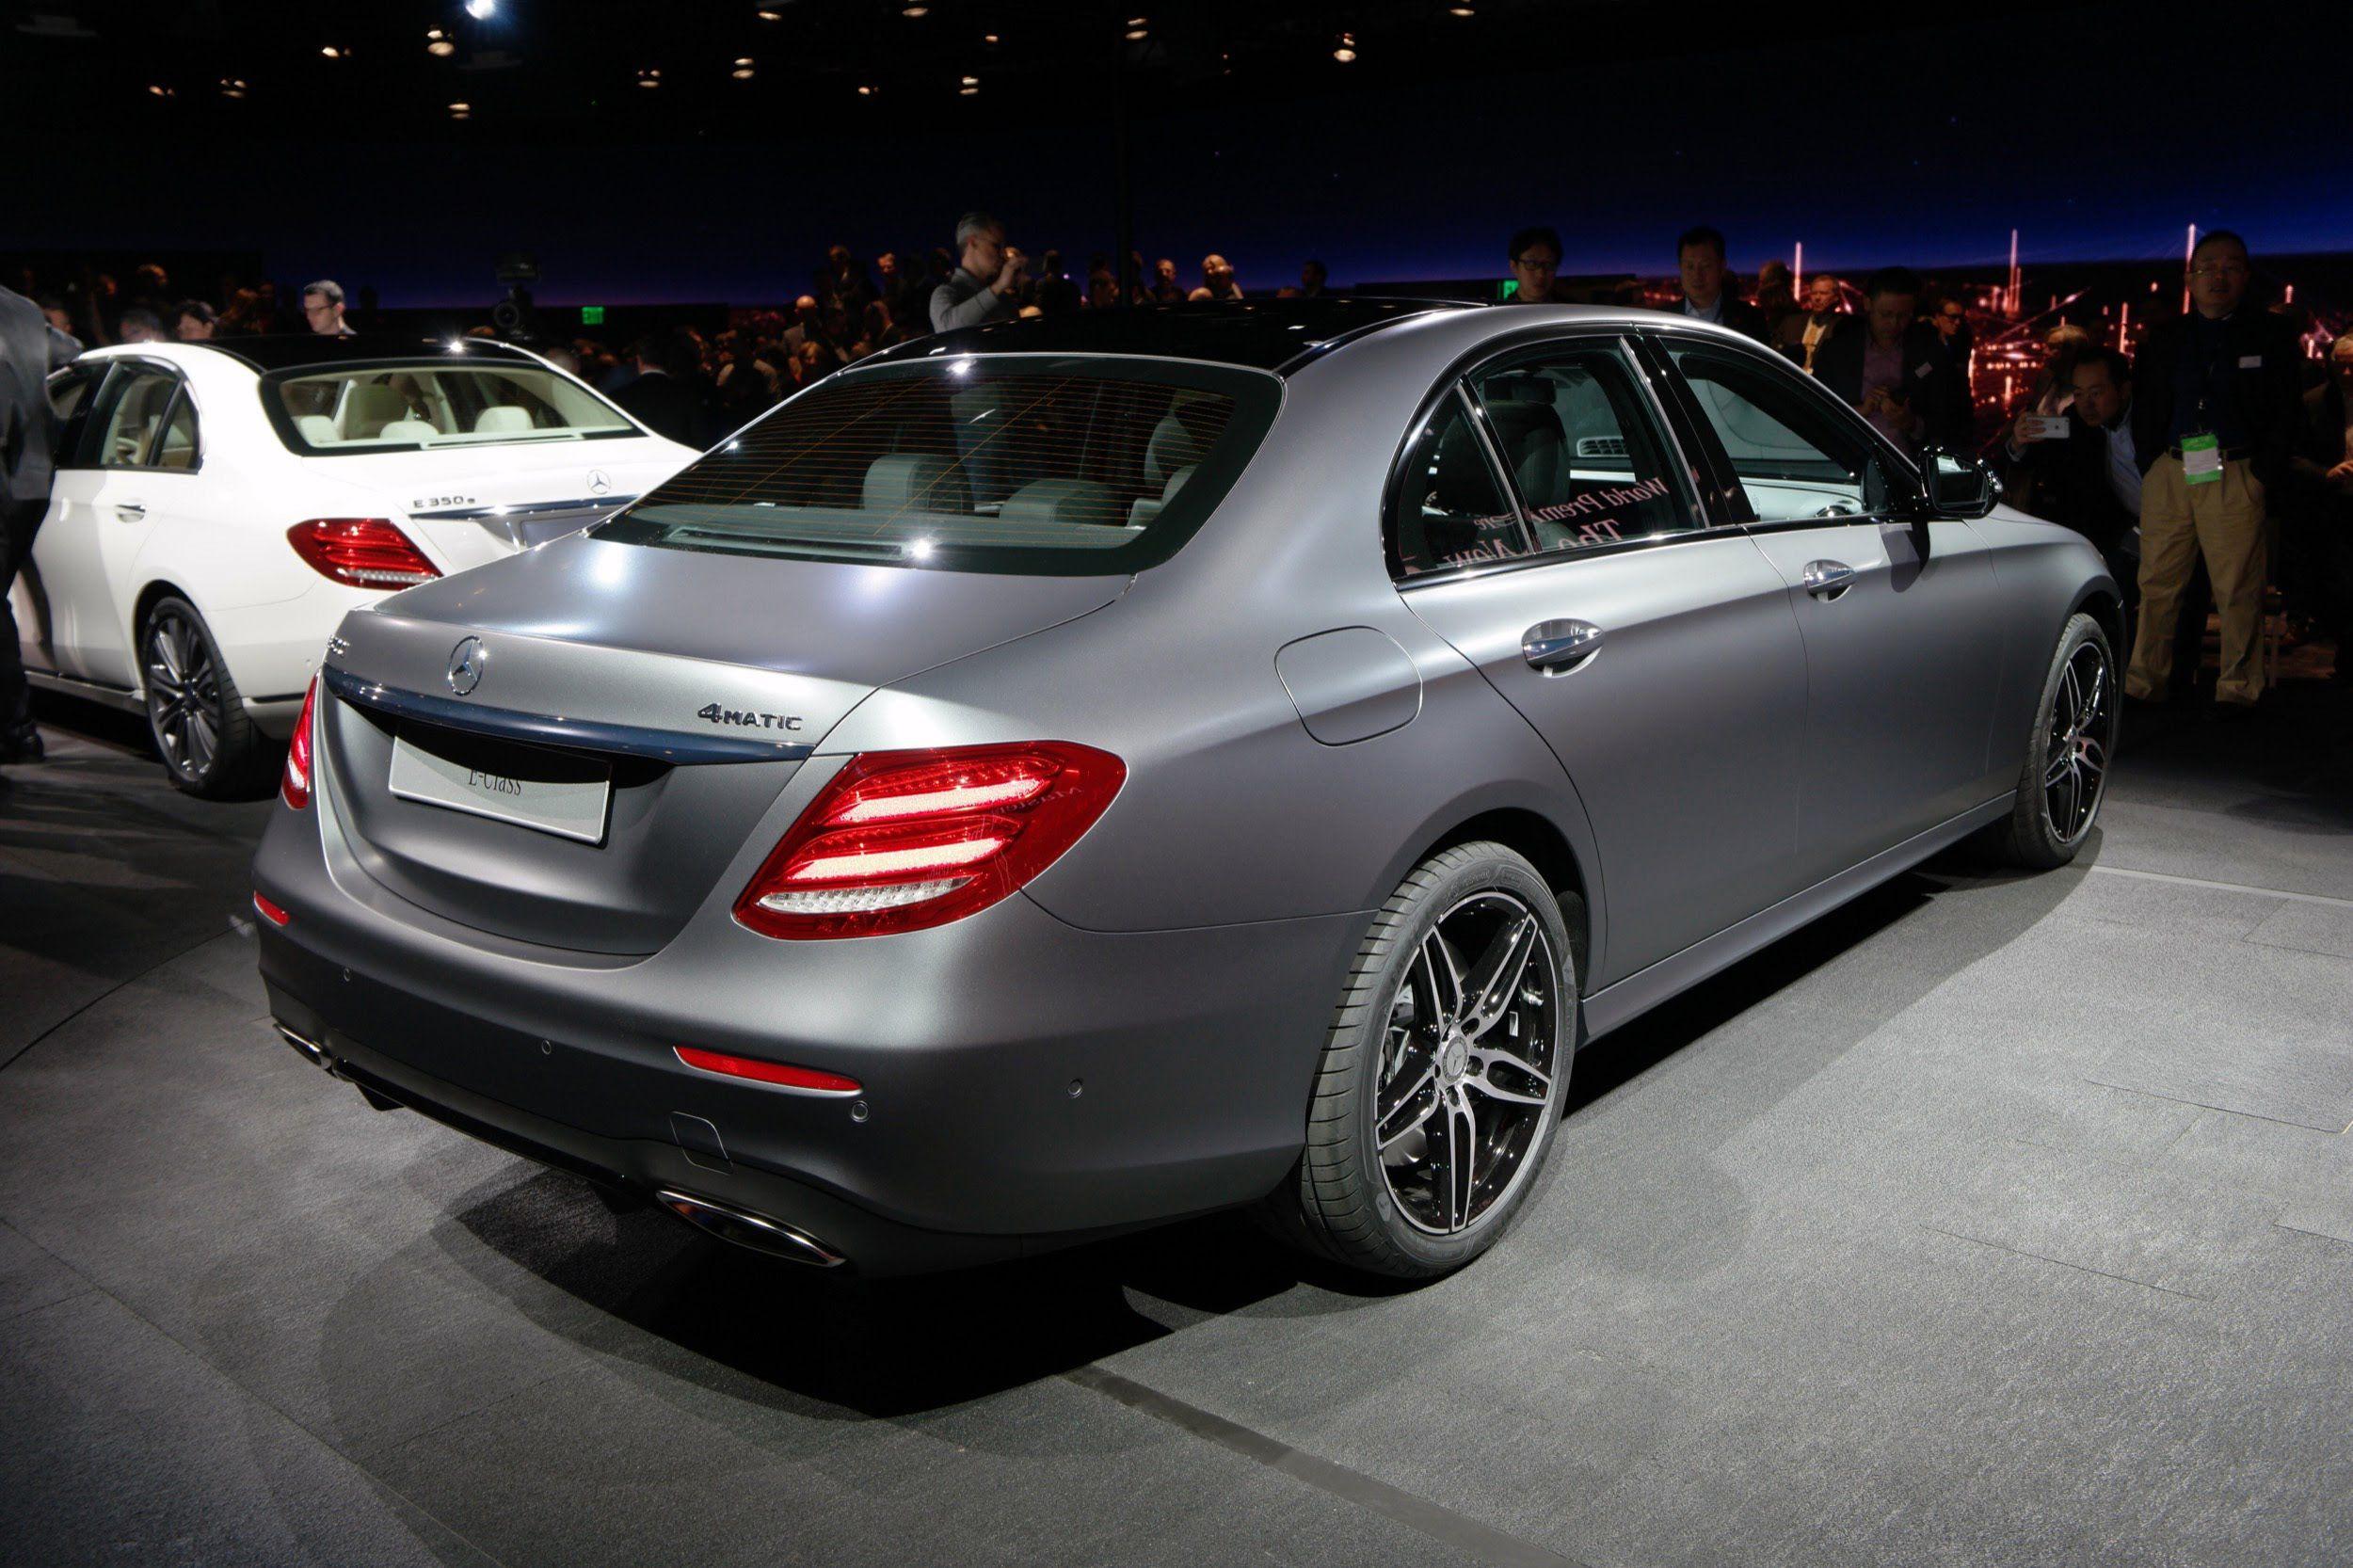 Mercedes v class gets full treatment from carlex design - 2017 Mercedes Benz E Class Detroit Auto Show 2016